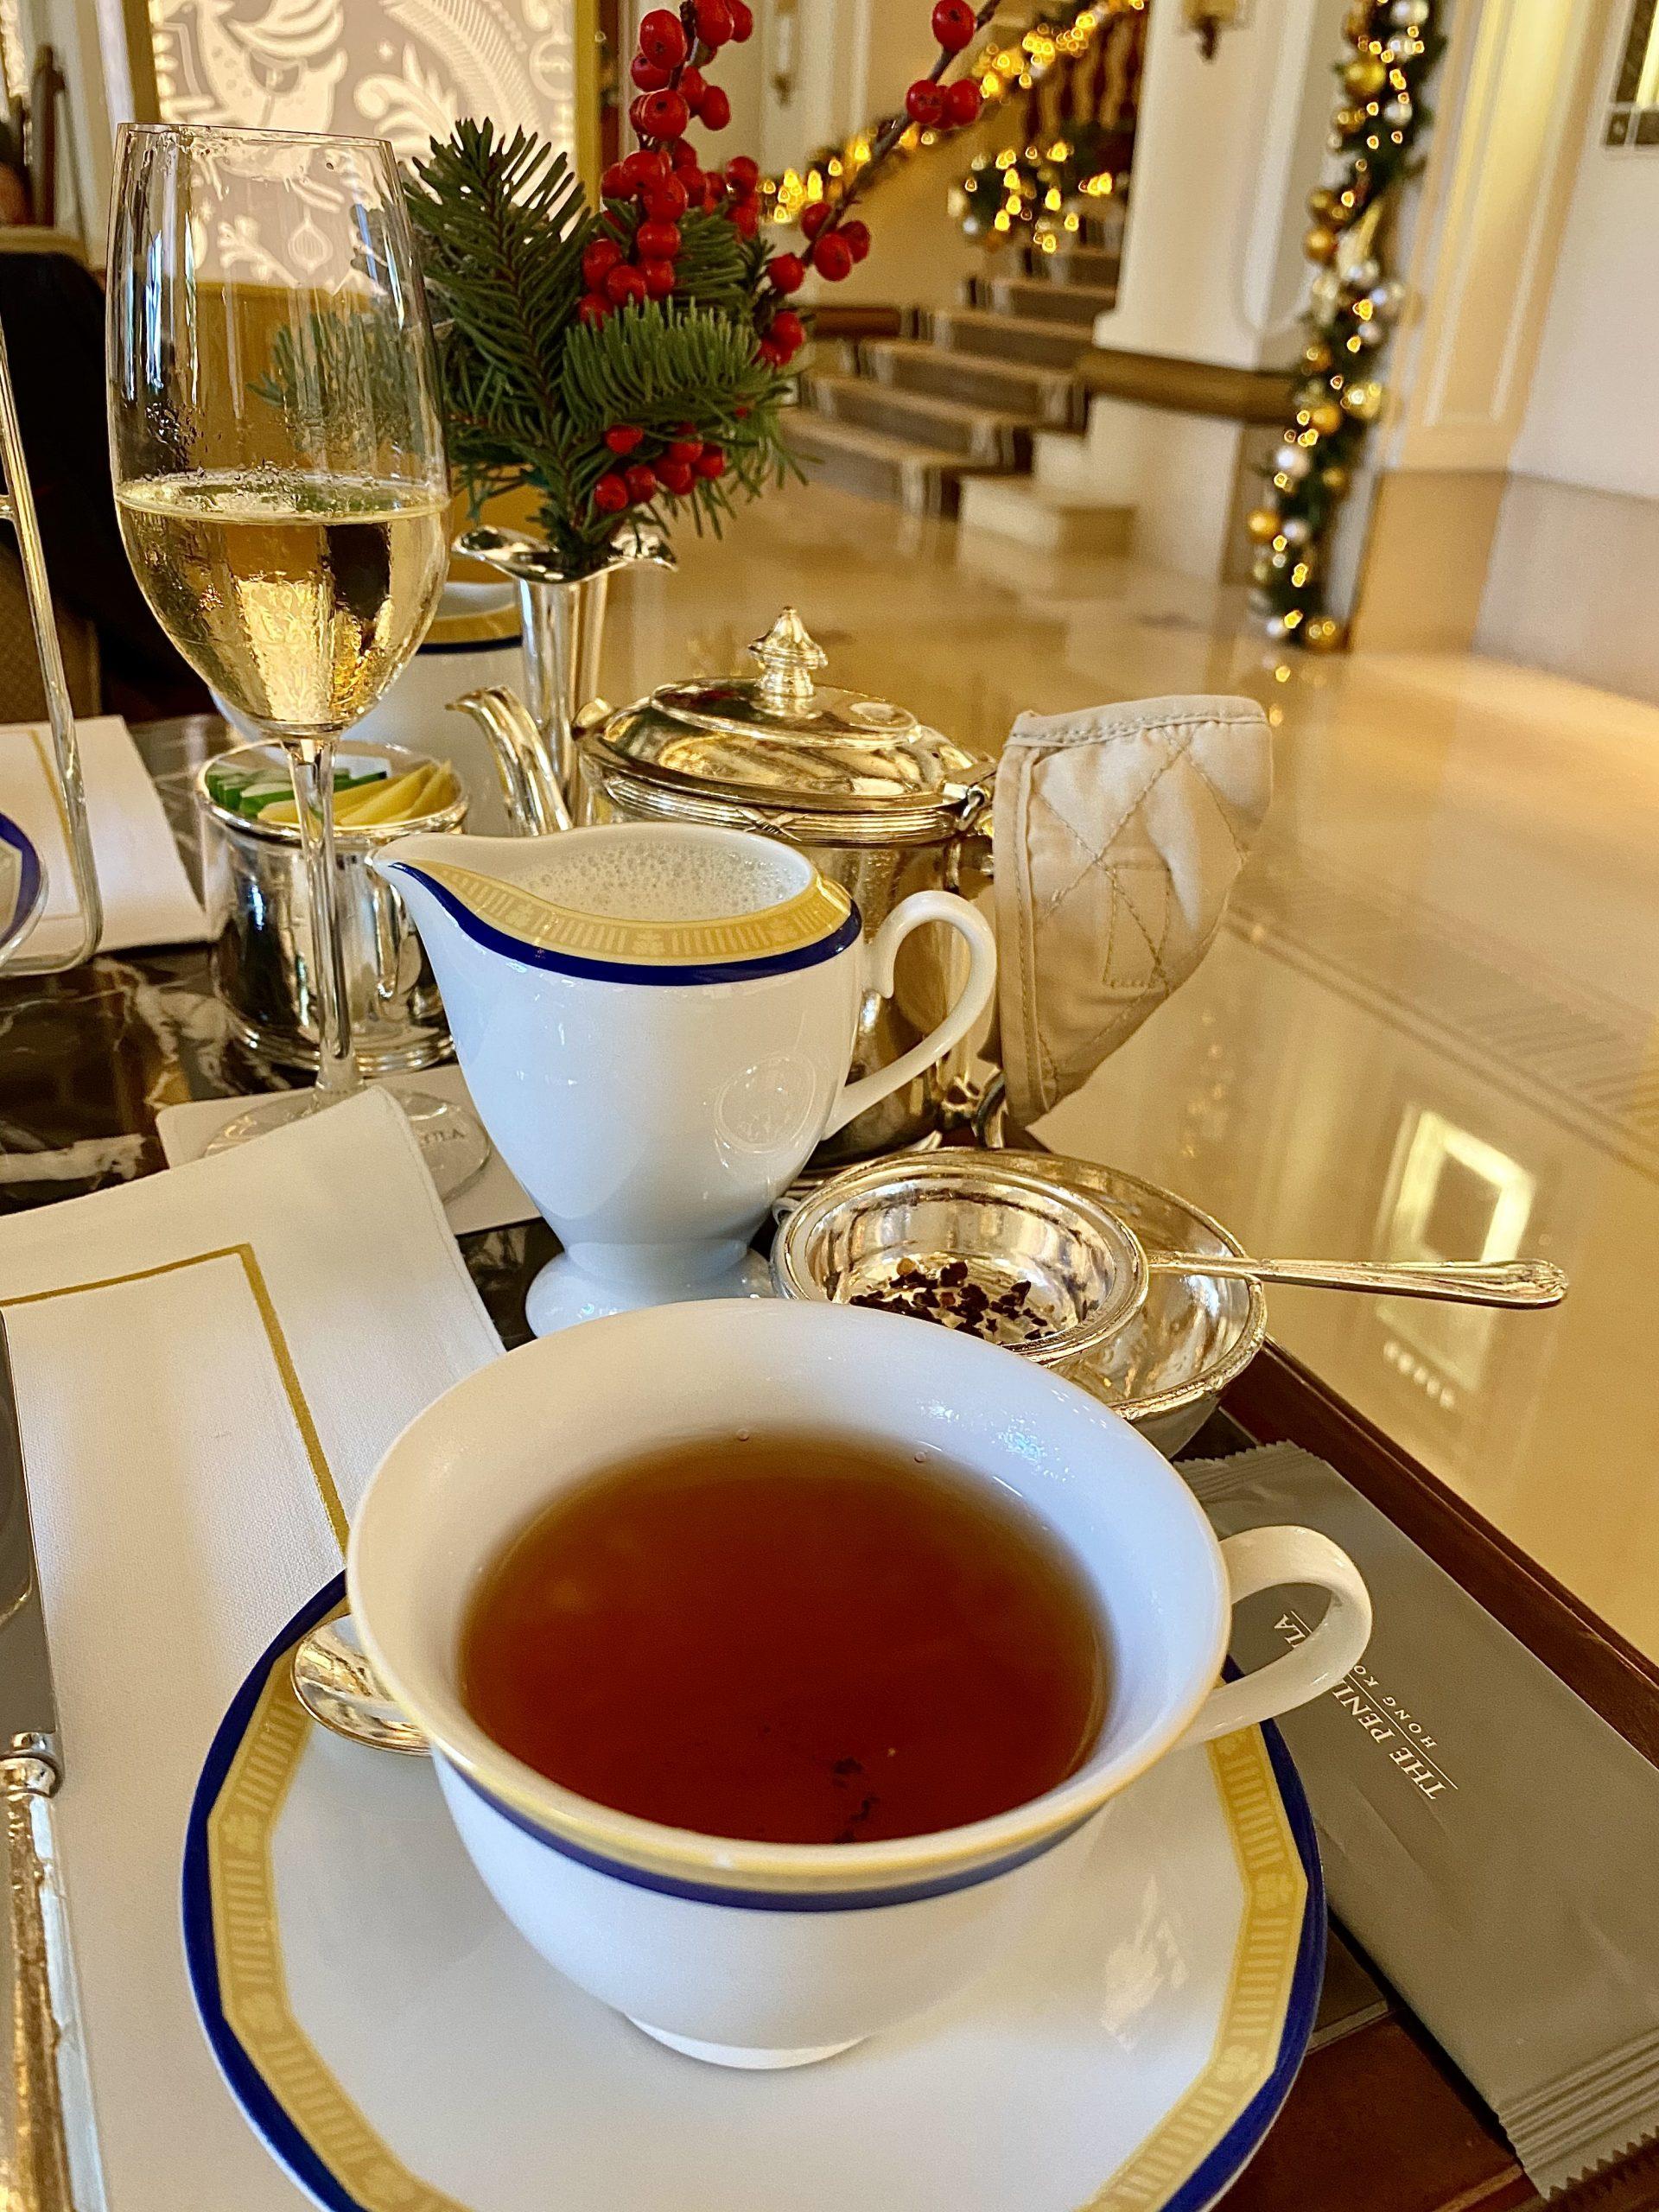 Afternoon tea at The Peninsula